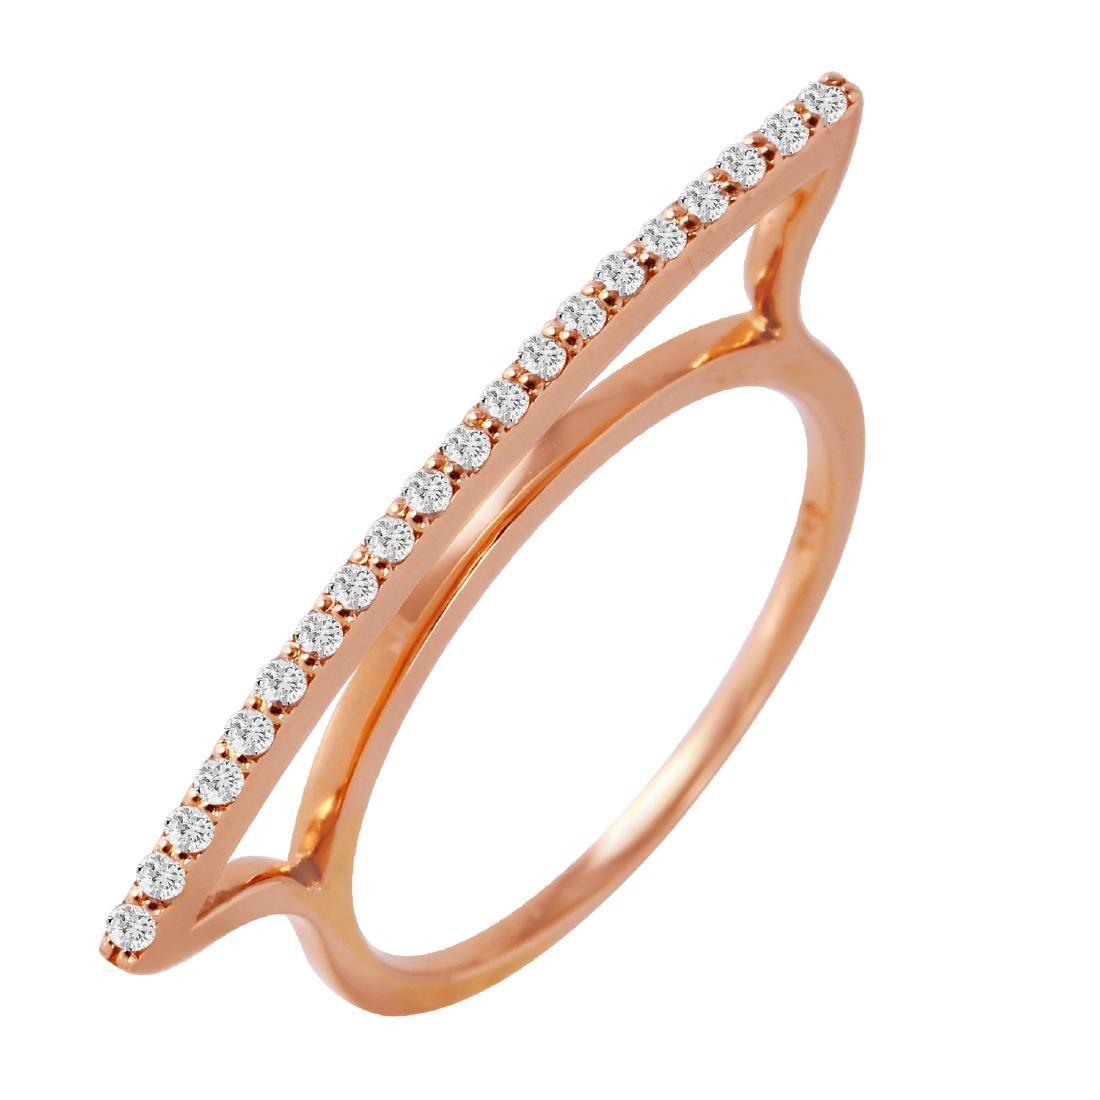 0.17 Carat Natural Diamond 18K Solid Rose Gold Ring